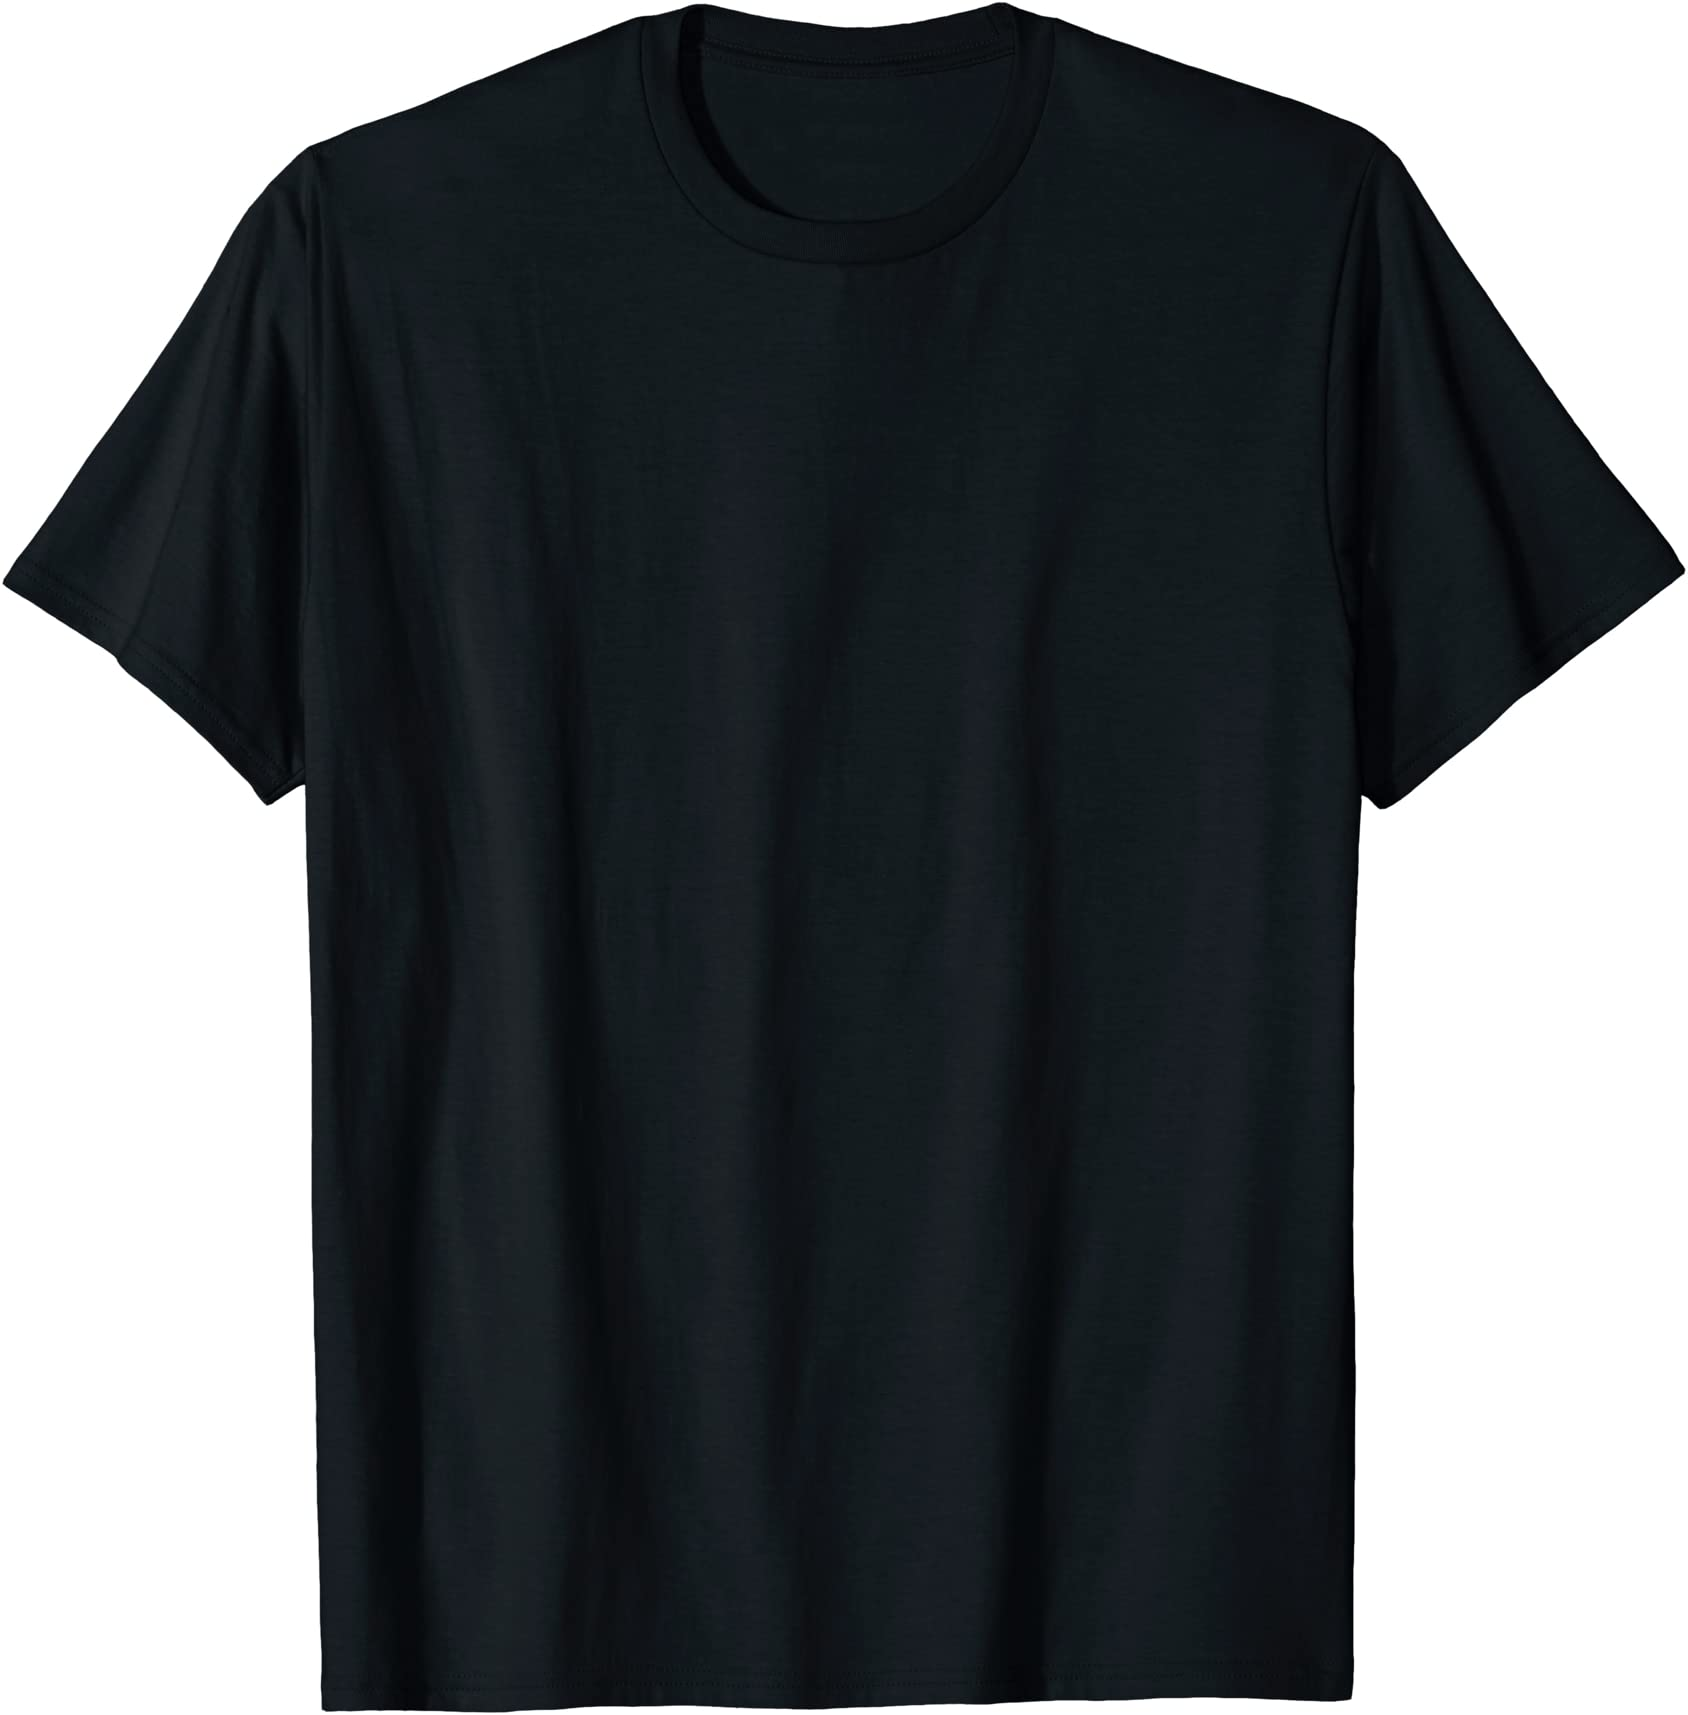 Penguin Costume Youth T-Shirt